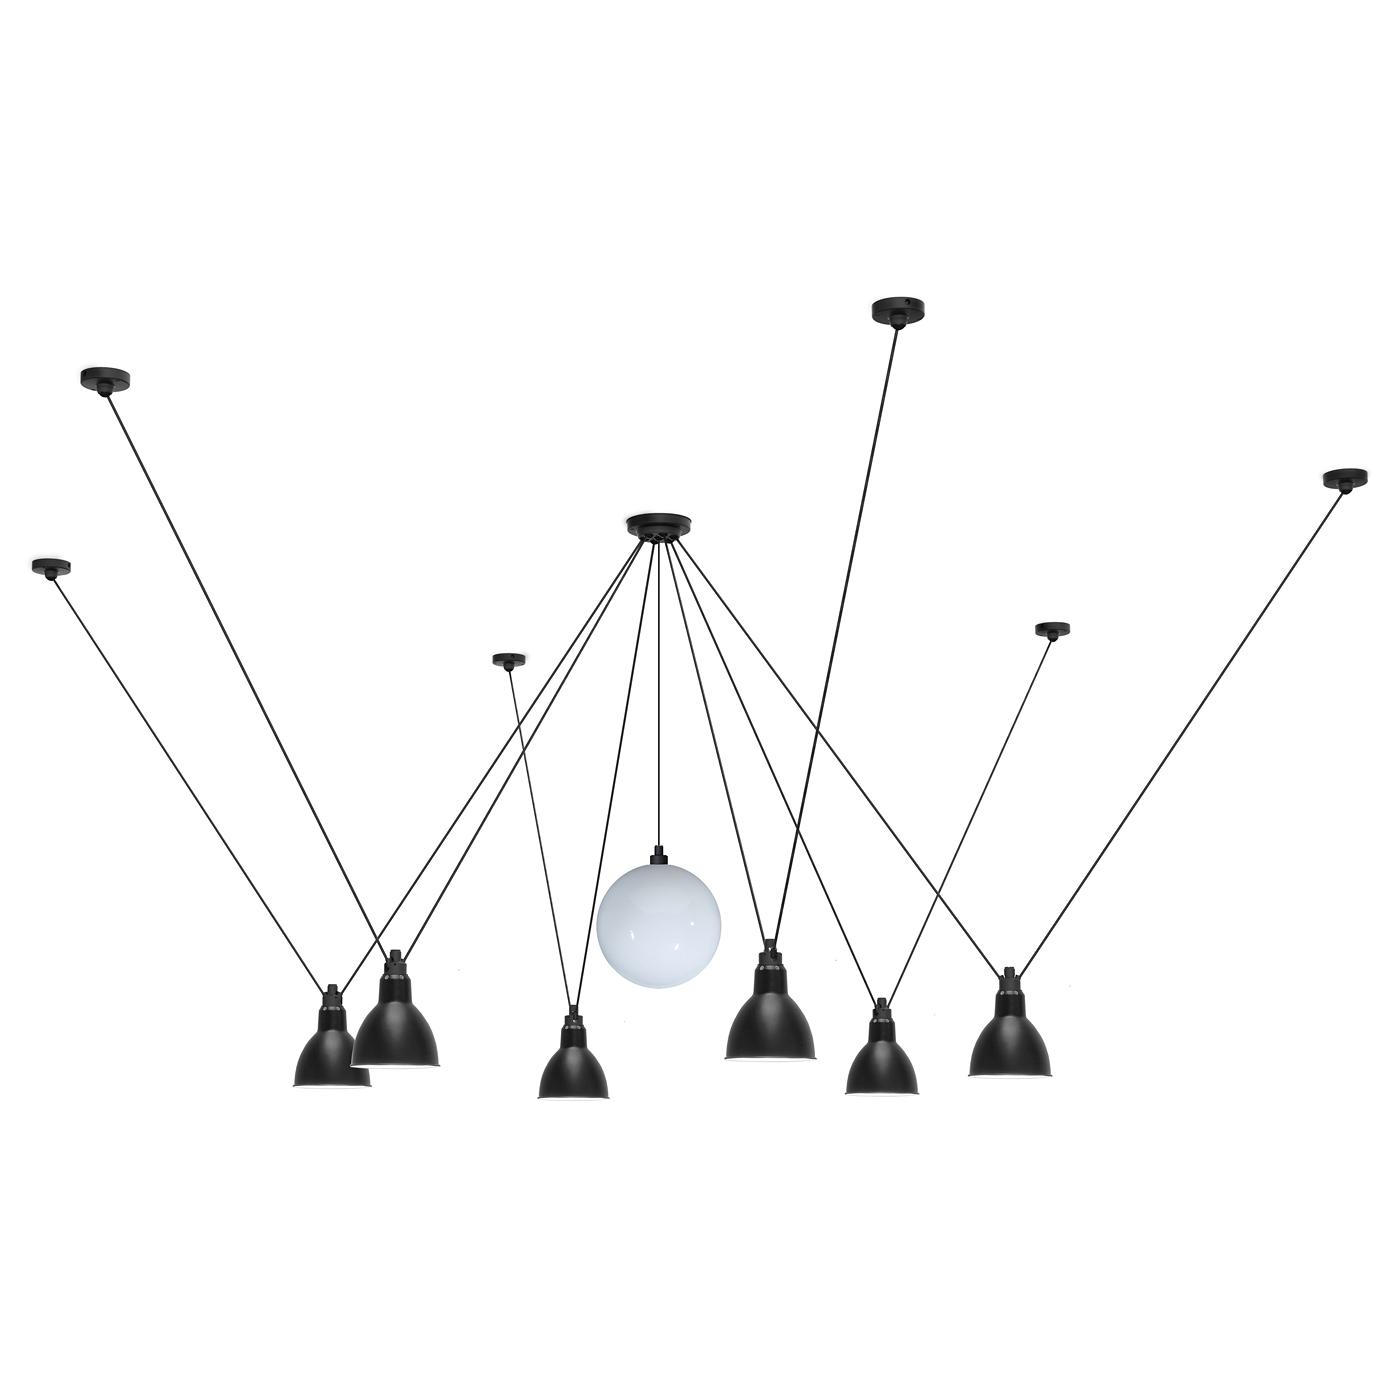 h ngeleuchten gruppe mit 7 variablen schirmen les acrobates n 327 casa lumi. Black Bedroom Furniture Sets. Home Design Ideas